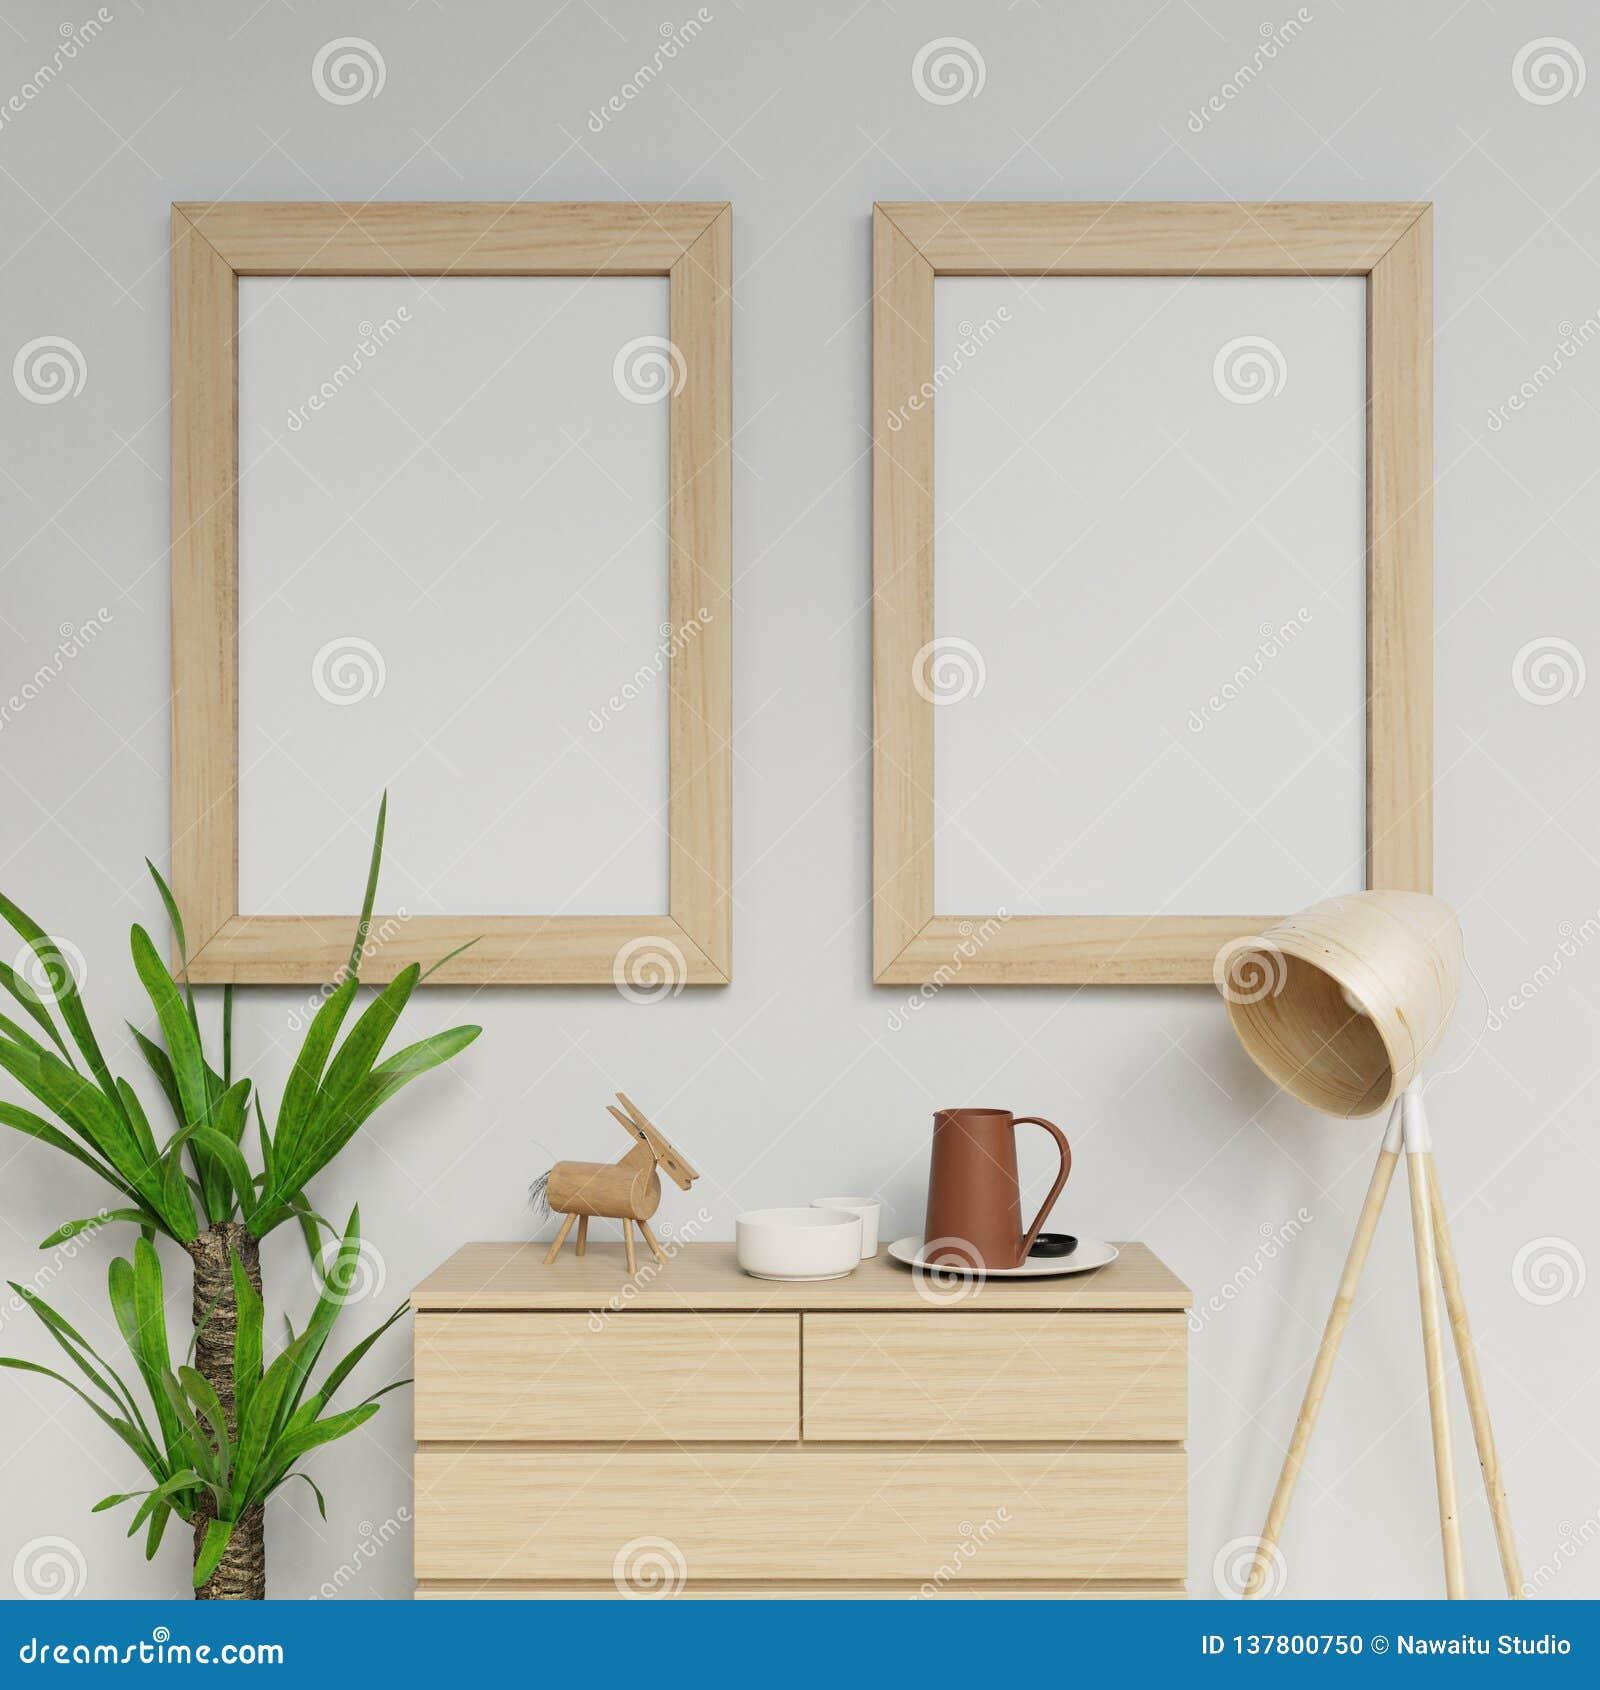 3d照片拟真的家庭内部回报两个a1海报大模型与垂悬在干净的垂直的木制框架的设计模板